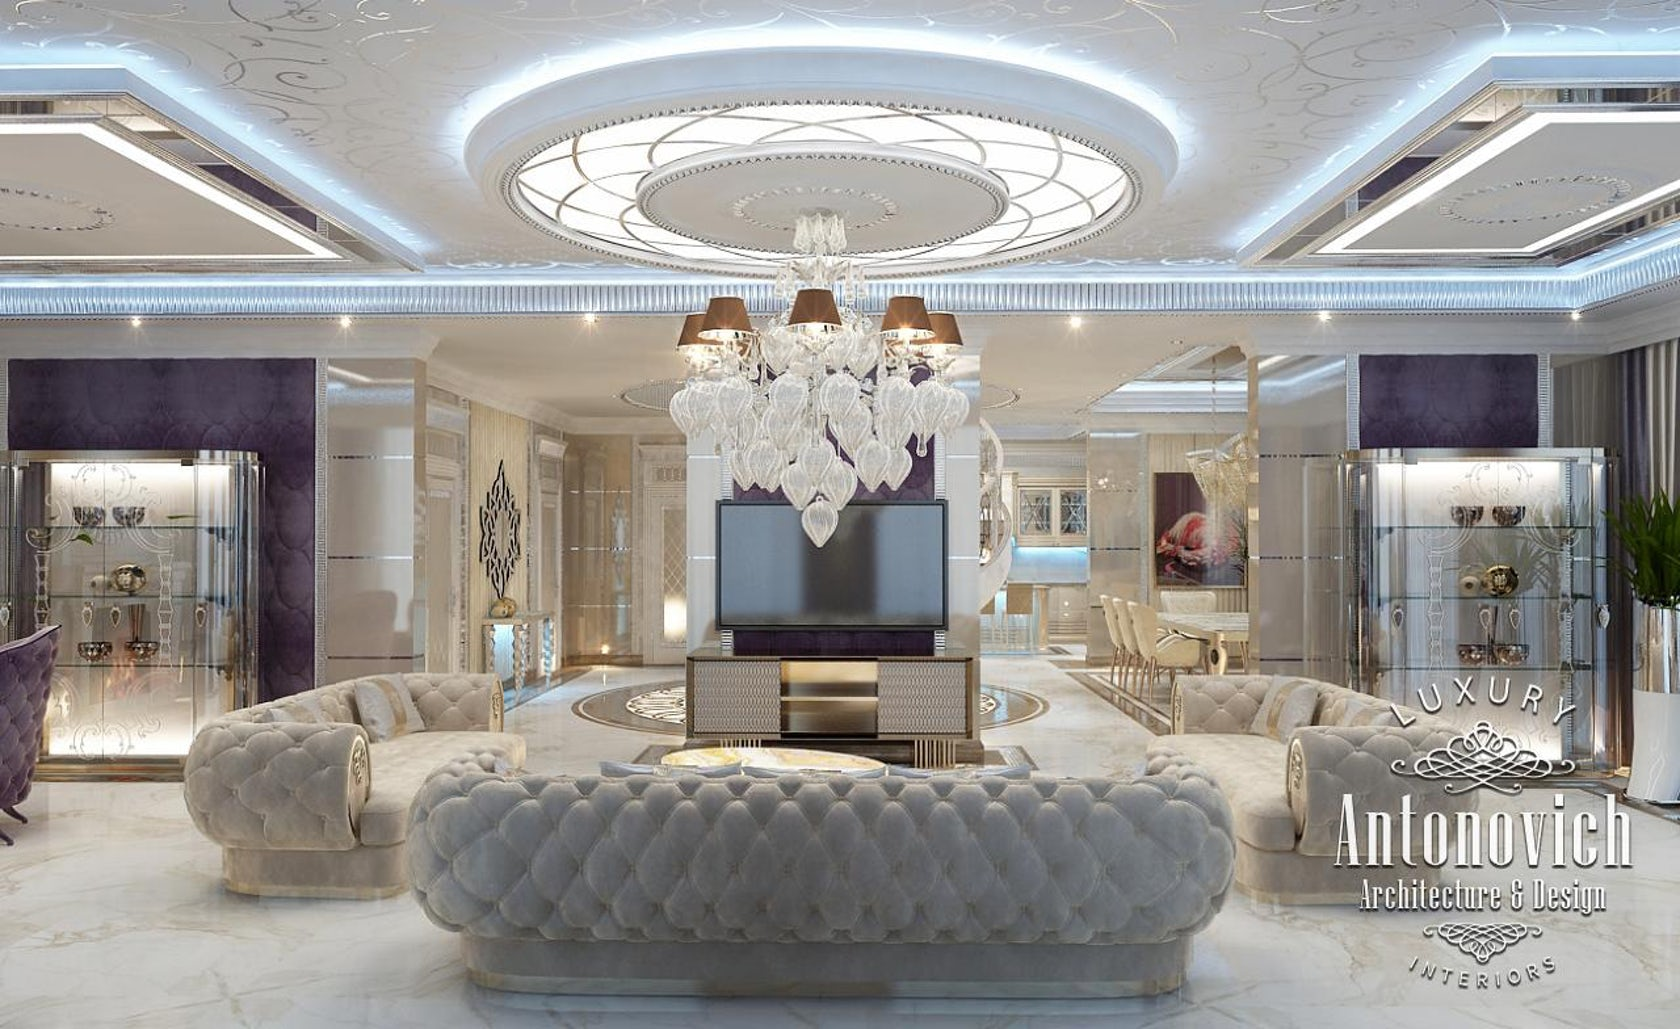 luxury interior design dubai from katrina antonovich. Black Bedroom Furniture Sets. Home Design Ideas